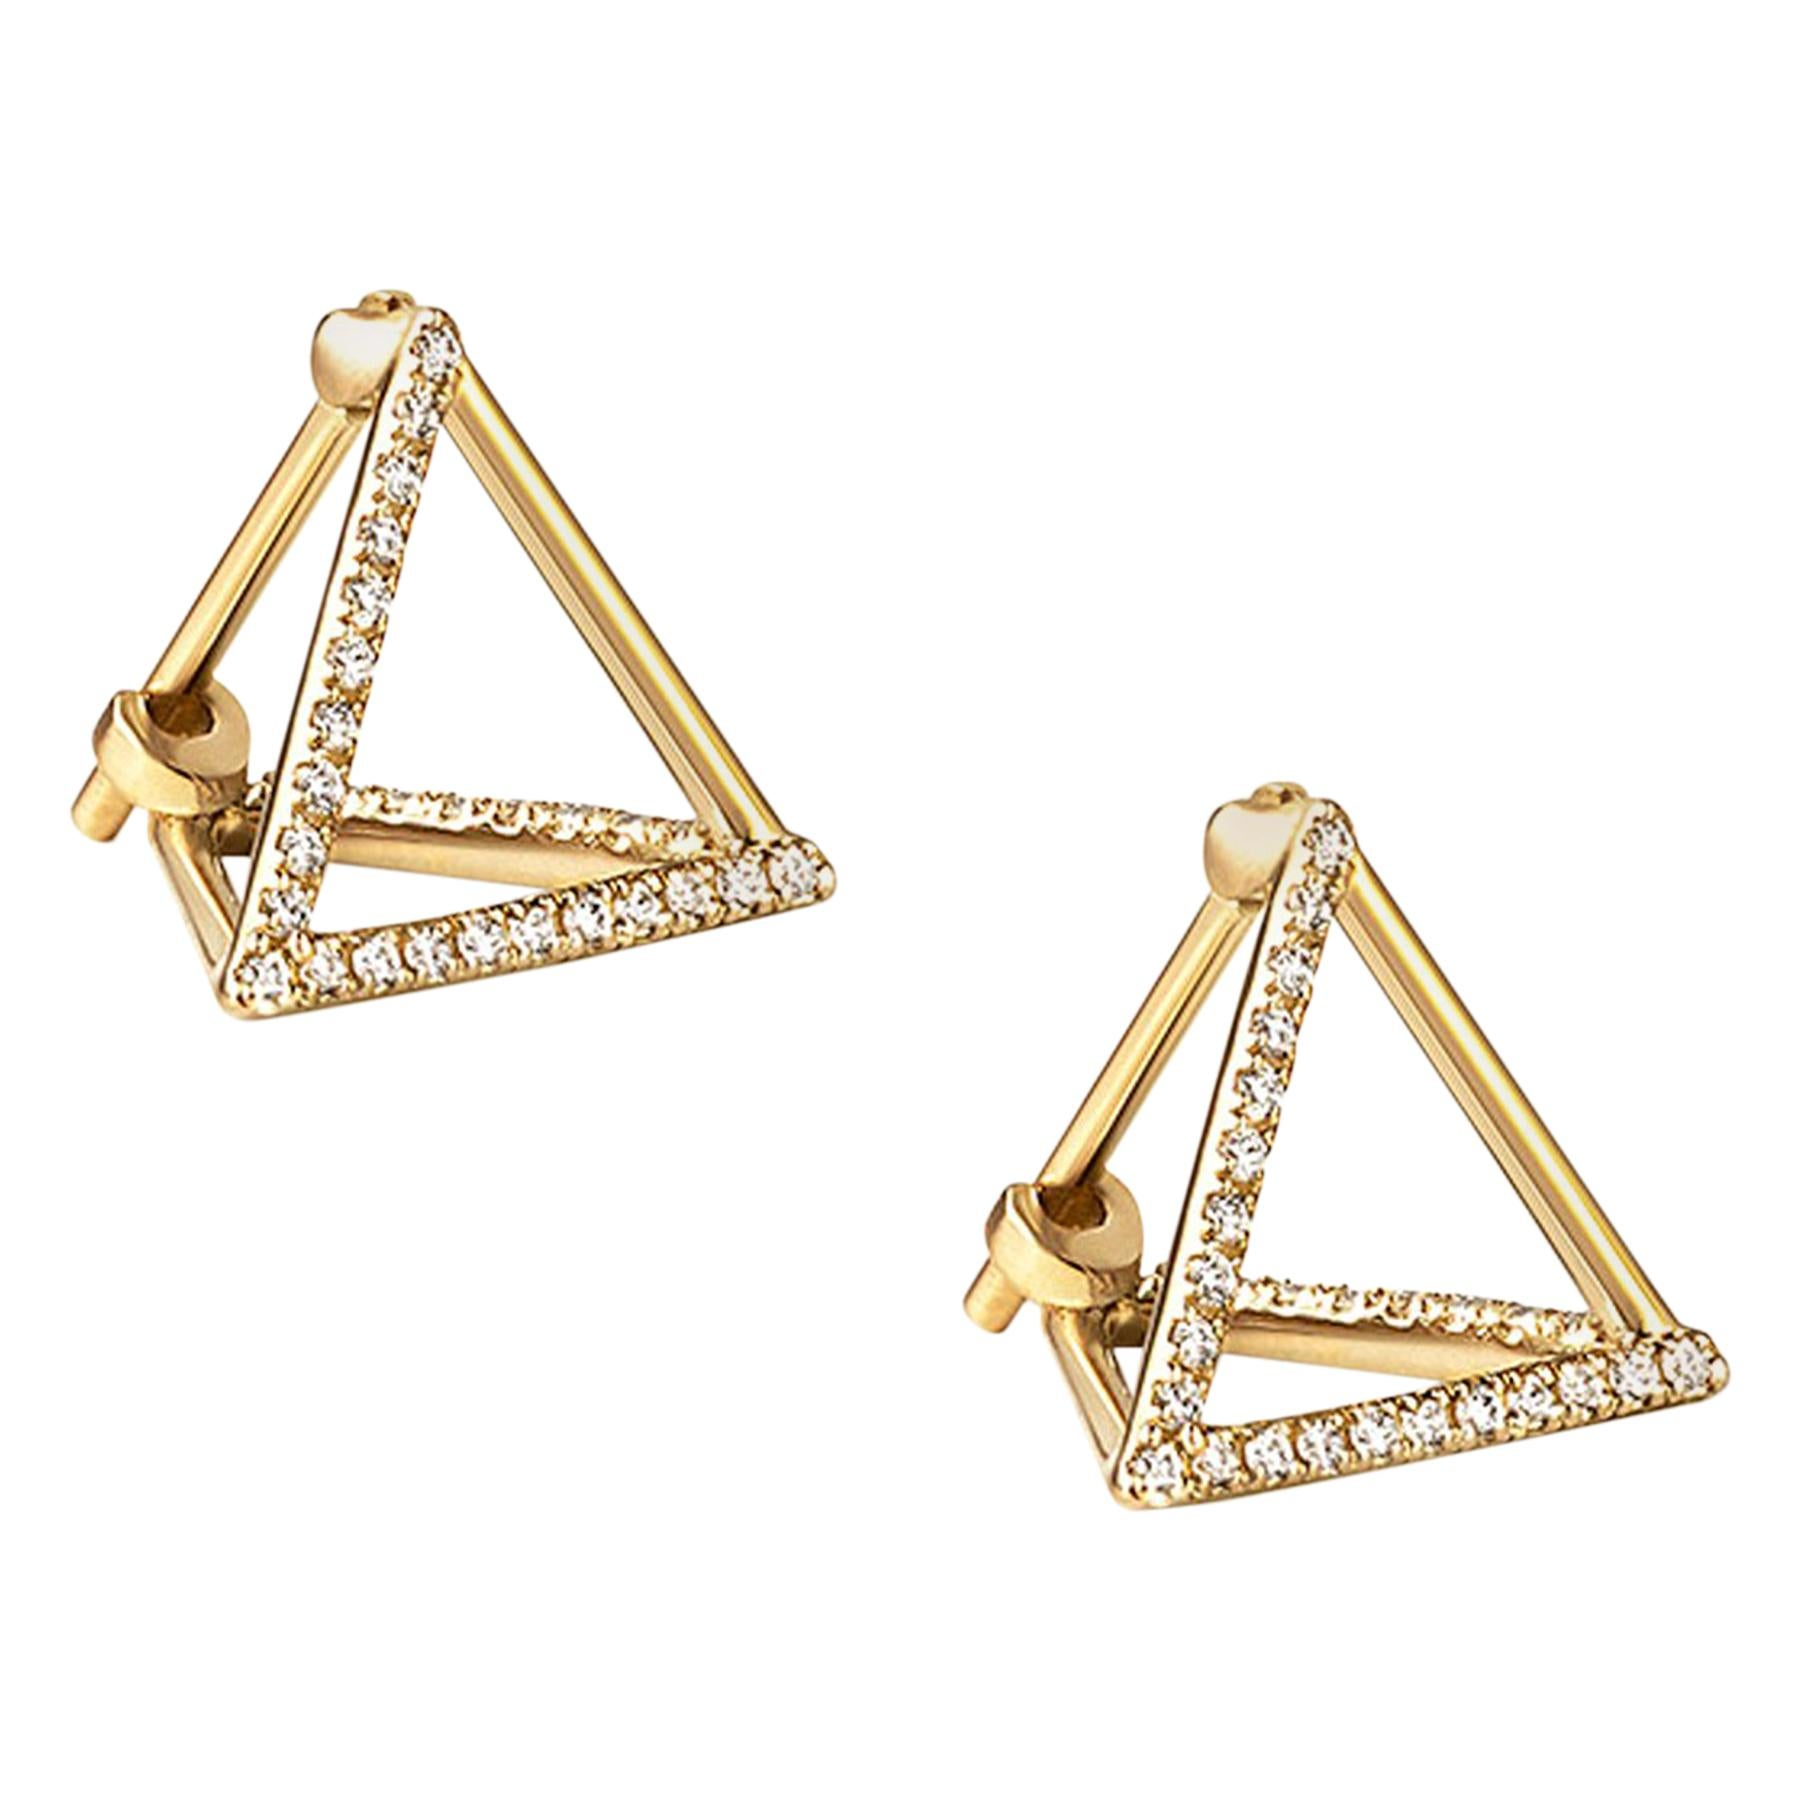 18 Karat Yellow Gold Diamond Triangle Stud Earrings